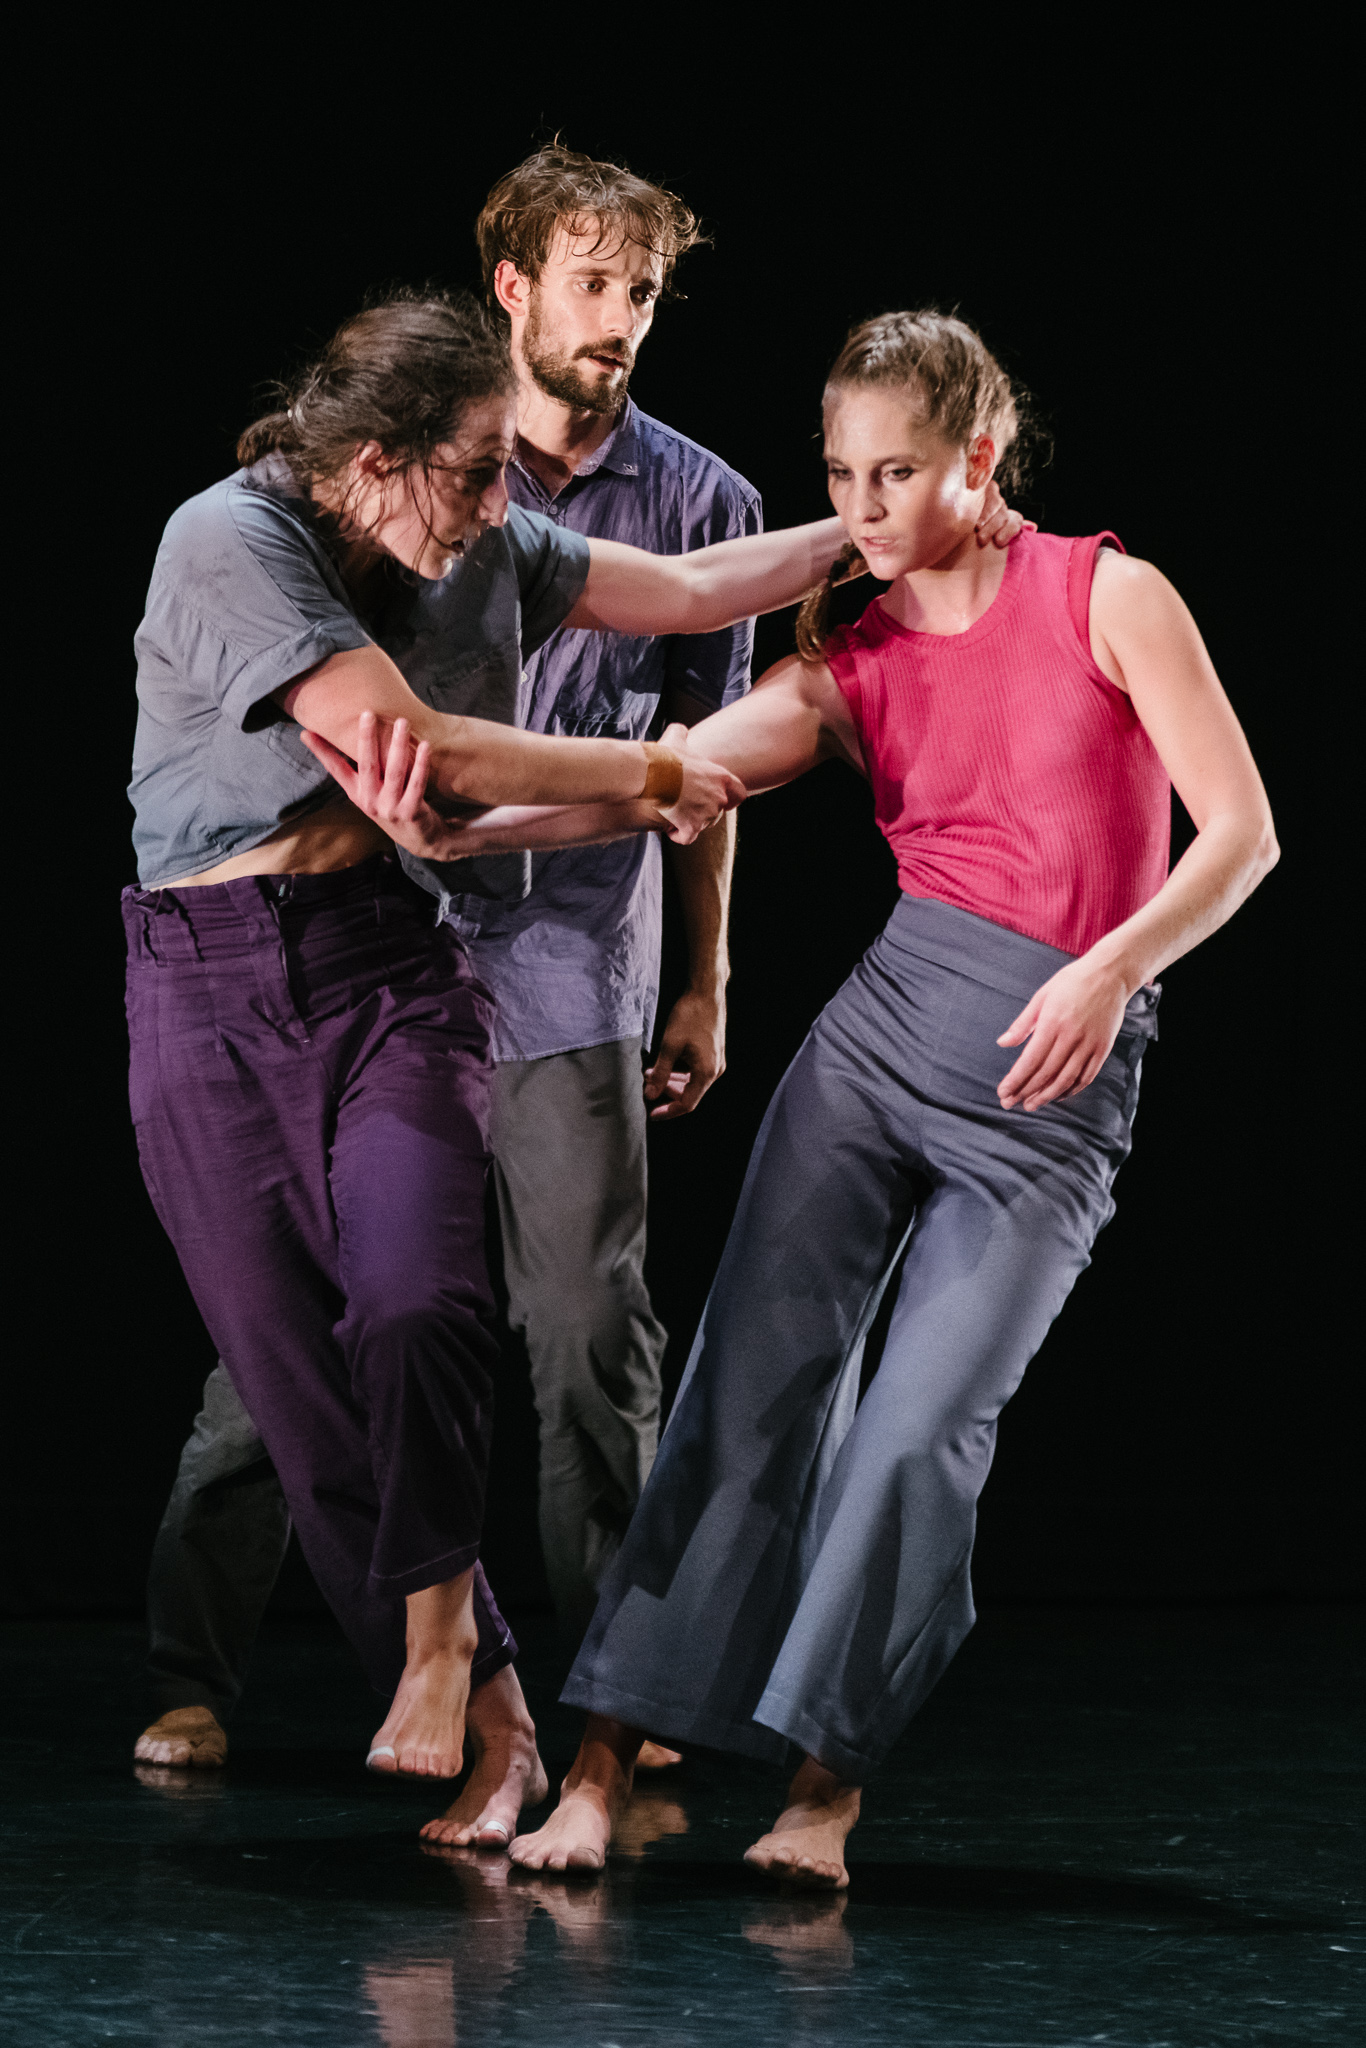 Hagit Yakira dance photography, fotografia de escena, fotografo de danza, dance photographer, stage photography